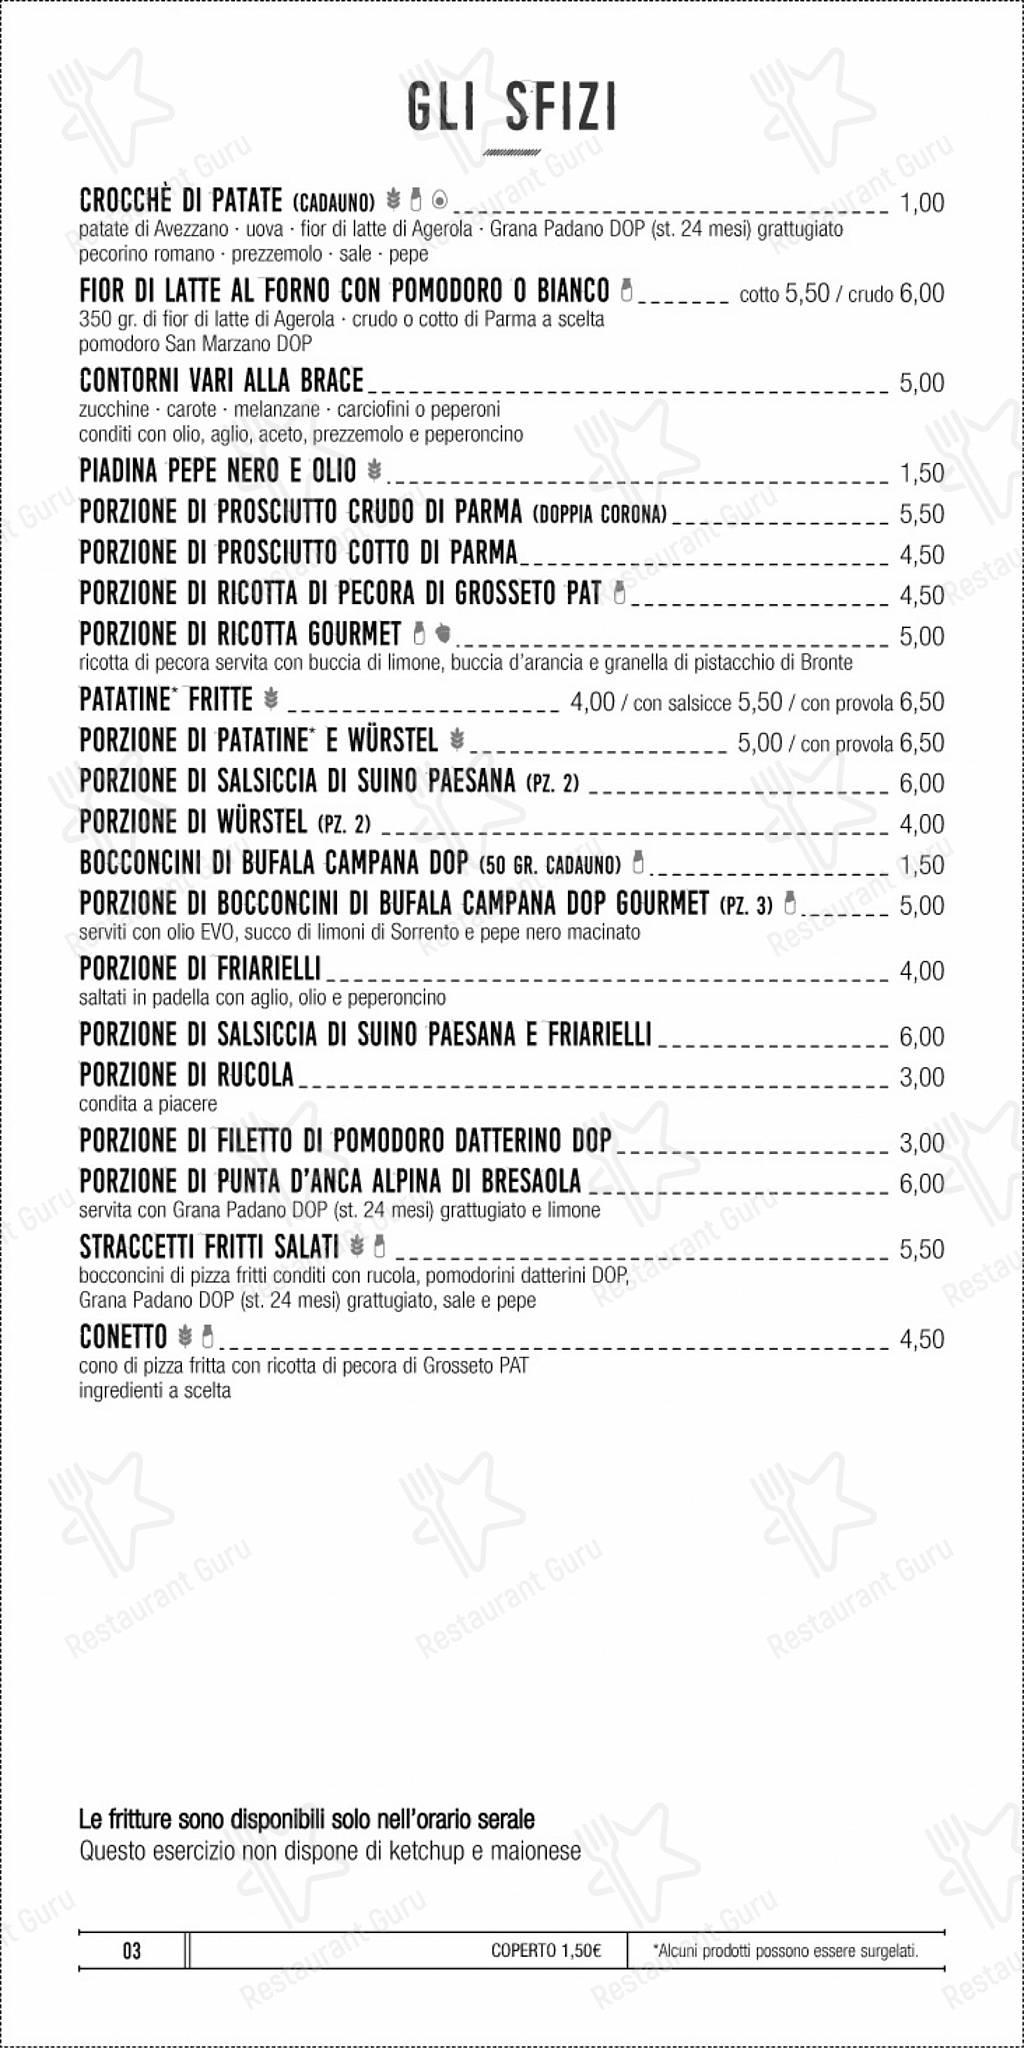 Di Napoli menu - dishes and beverages